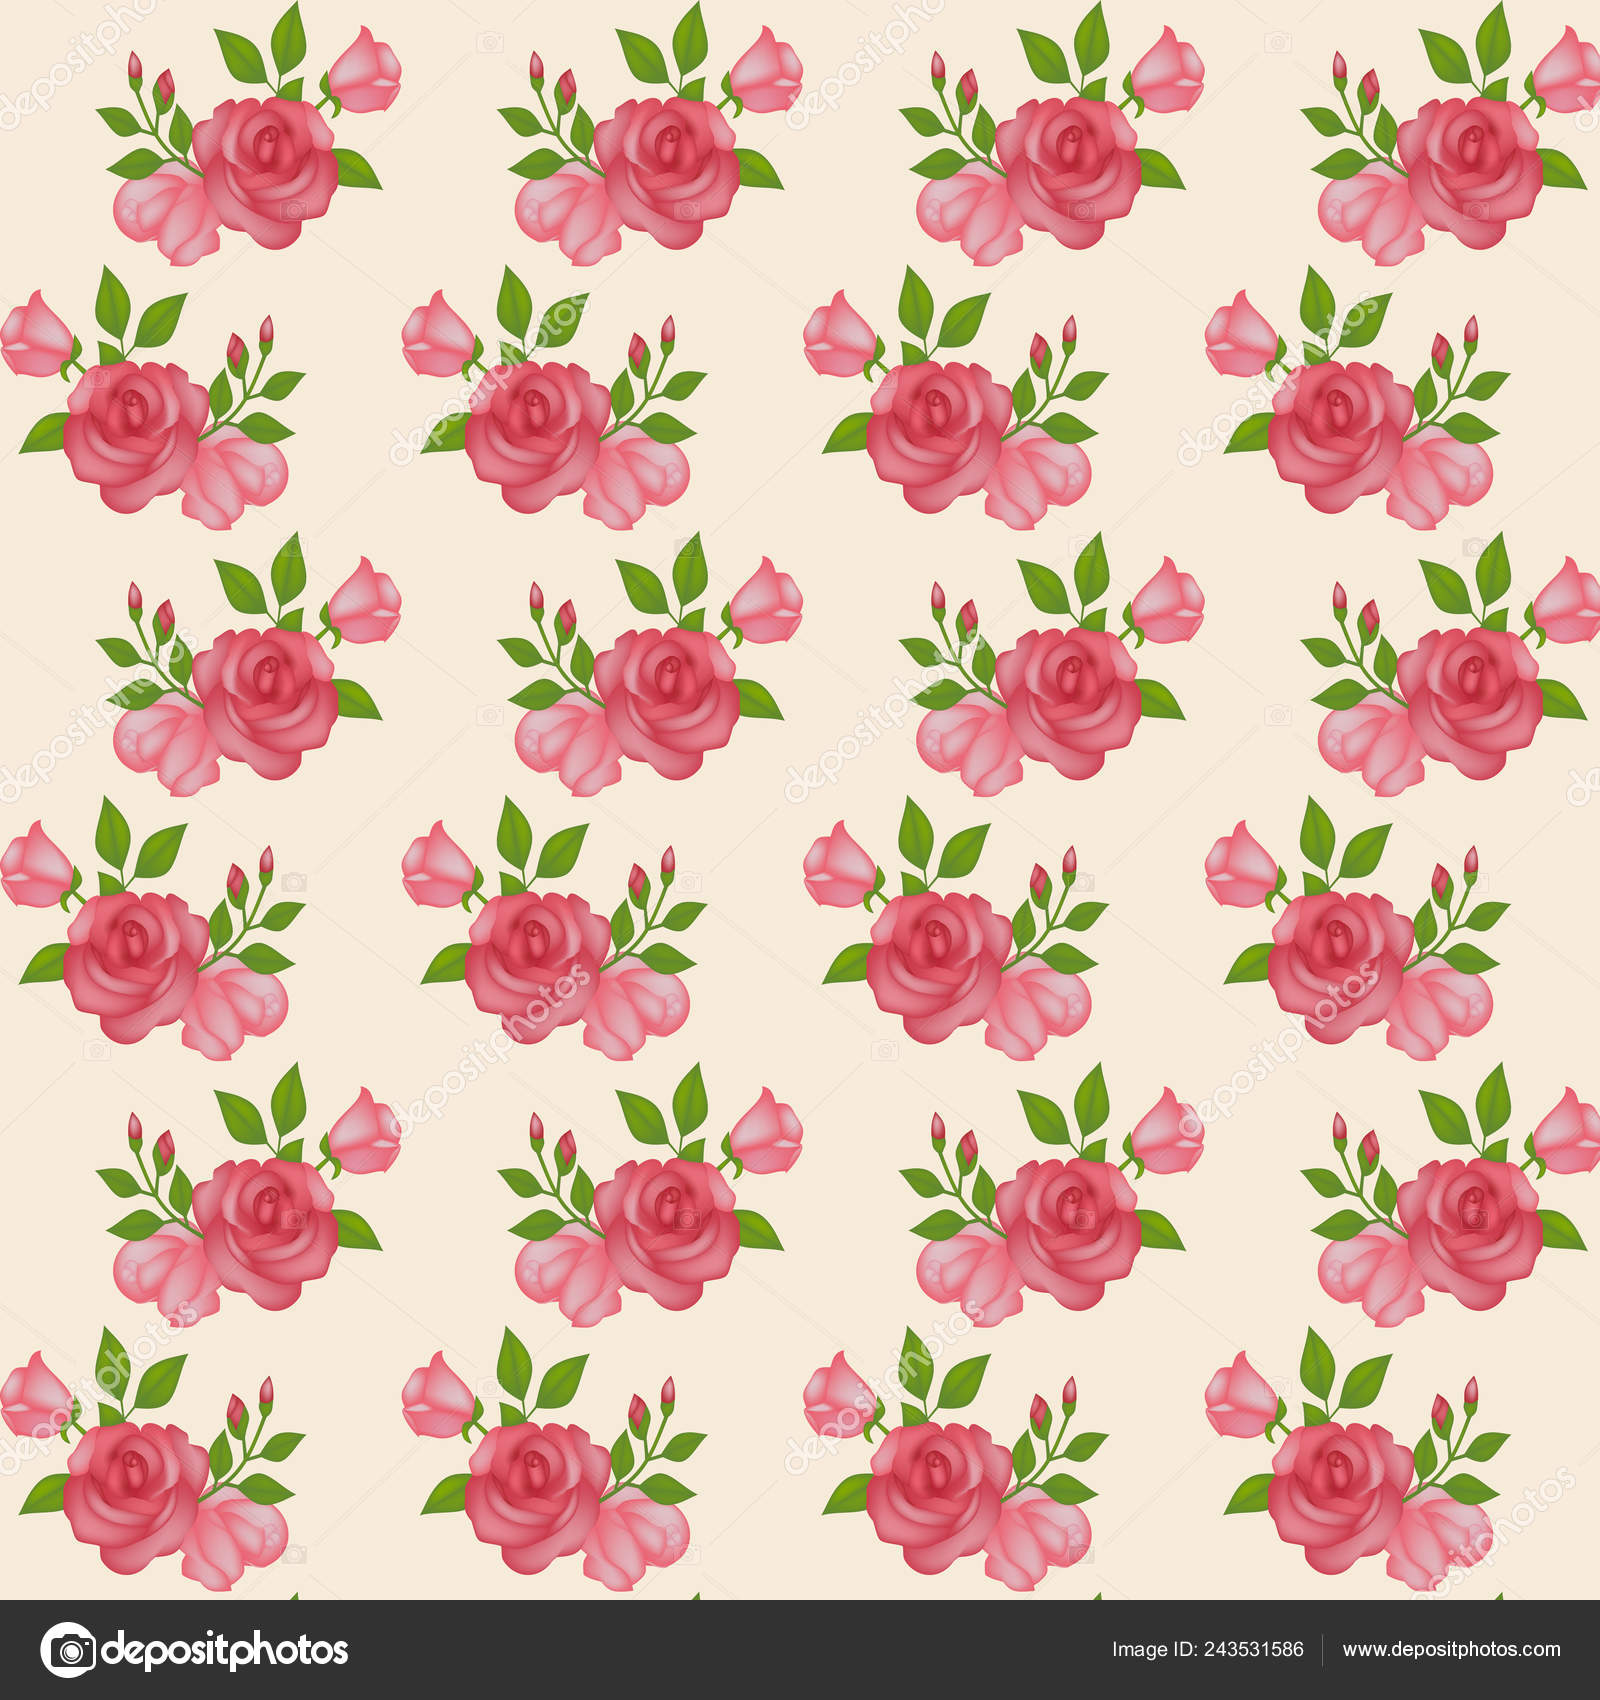 Flower Pattern Wallpaper Roses Scrapbooking Vintage Vivid